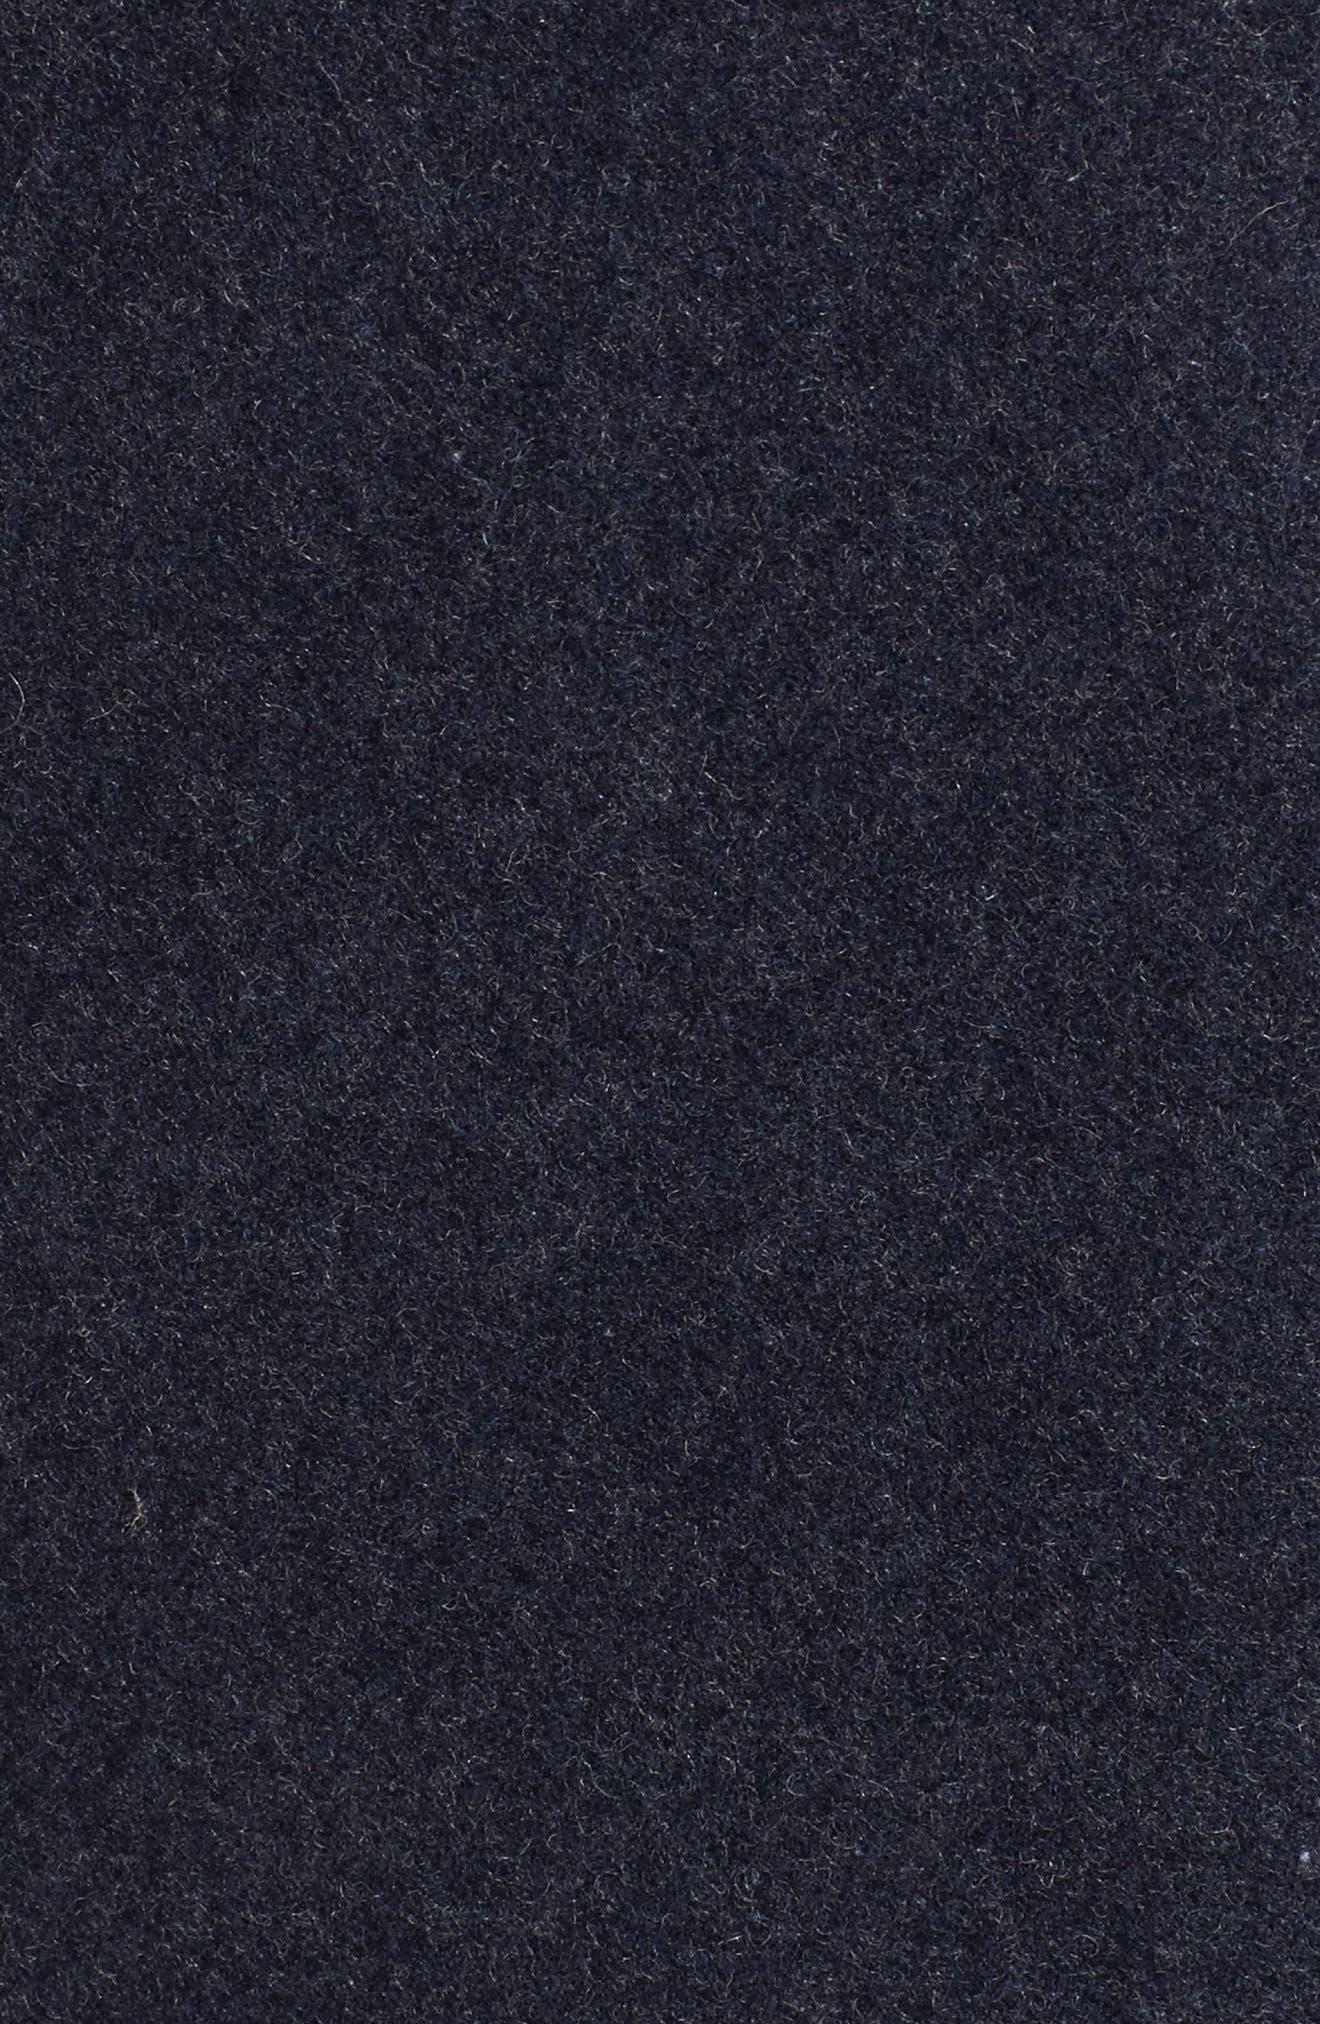 Mélange Bomber Jacket,                             Alternate thumbnail 6, color,                             402